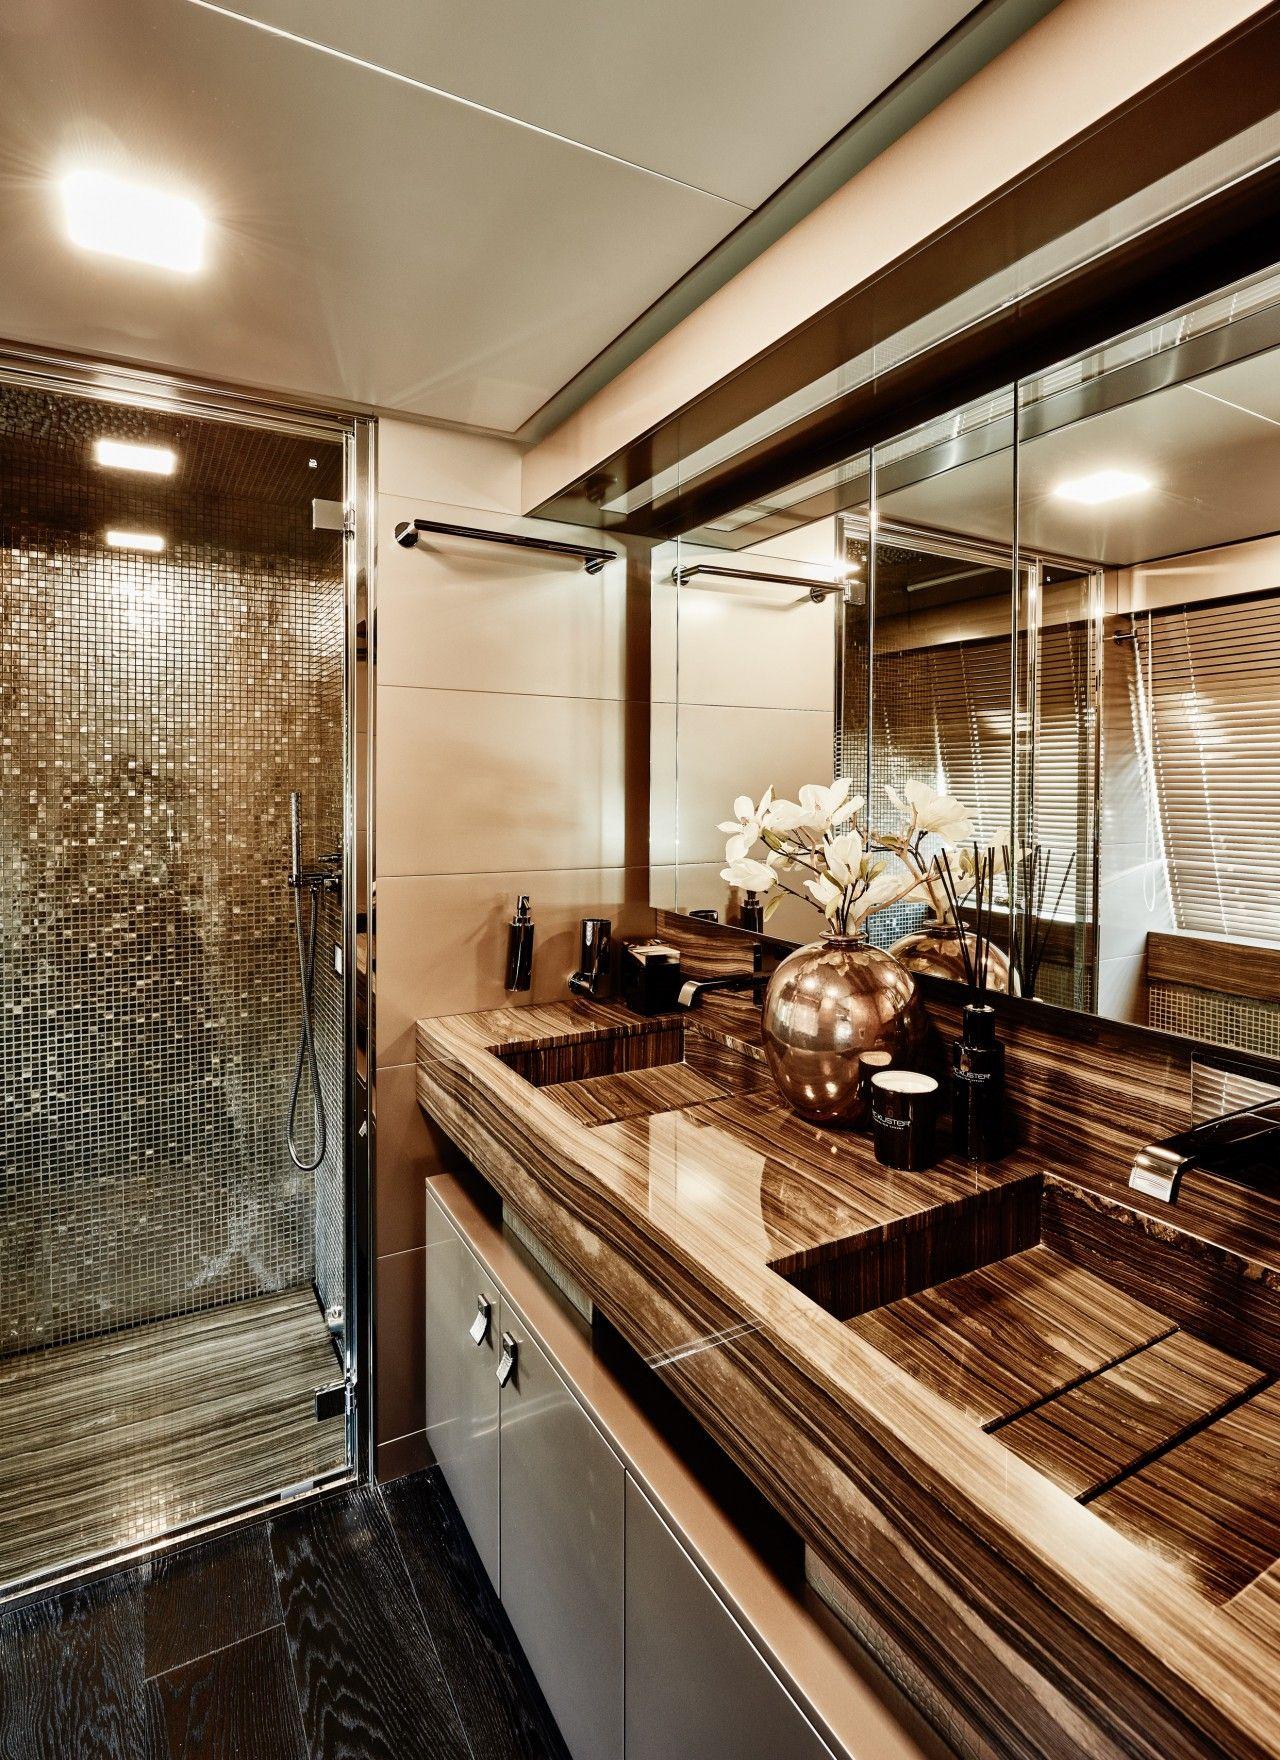 Eric Kuster | Luxury living | Pinterest - Badkamers, Badkamer en ...